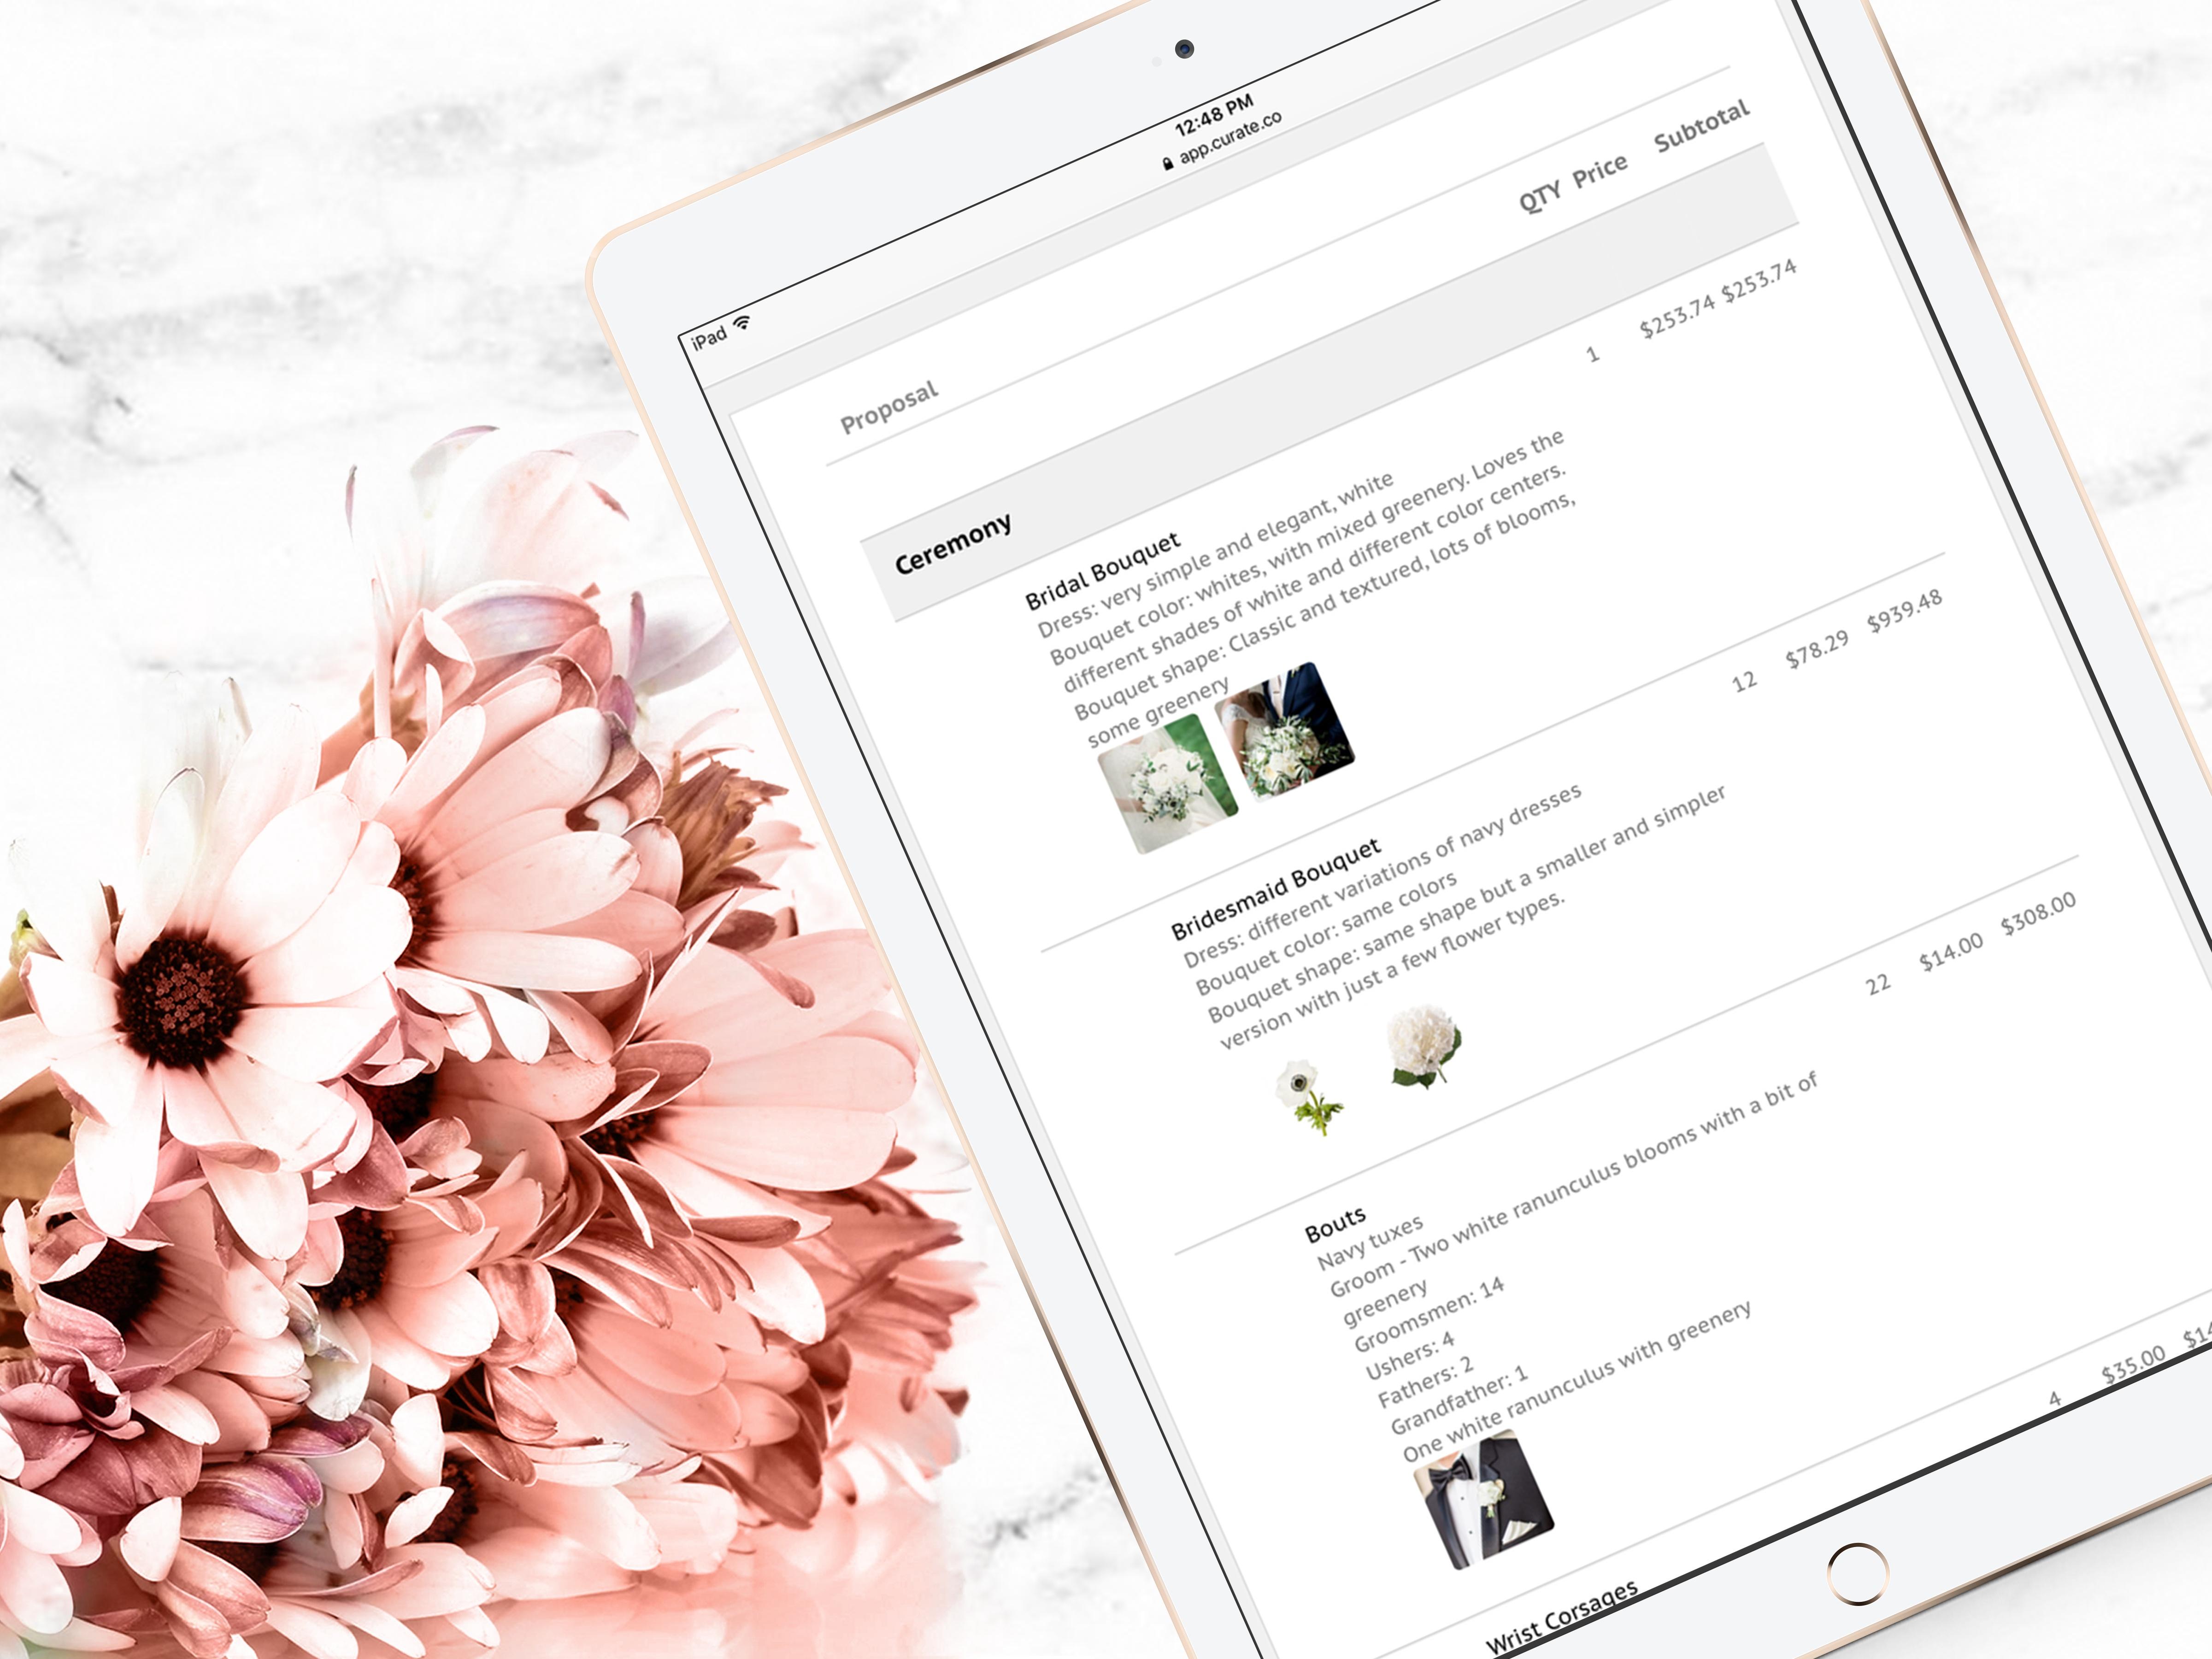 digital proposal with flowers-1.jpg